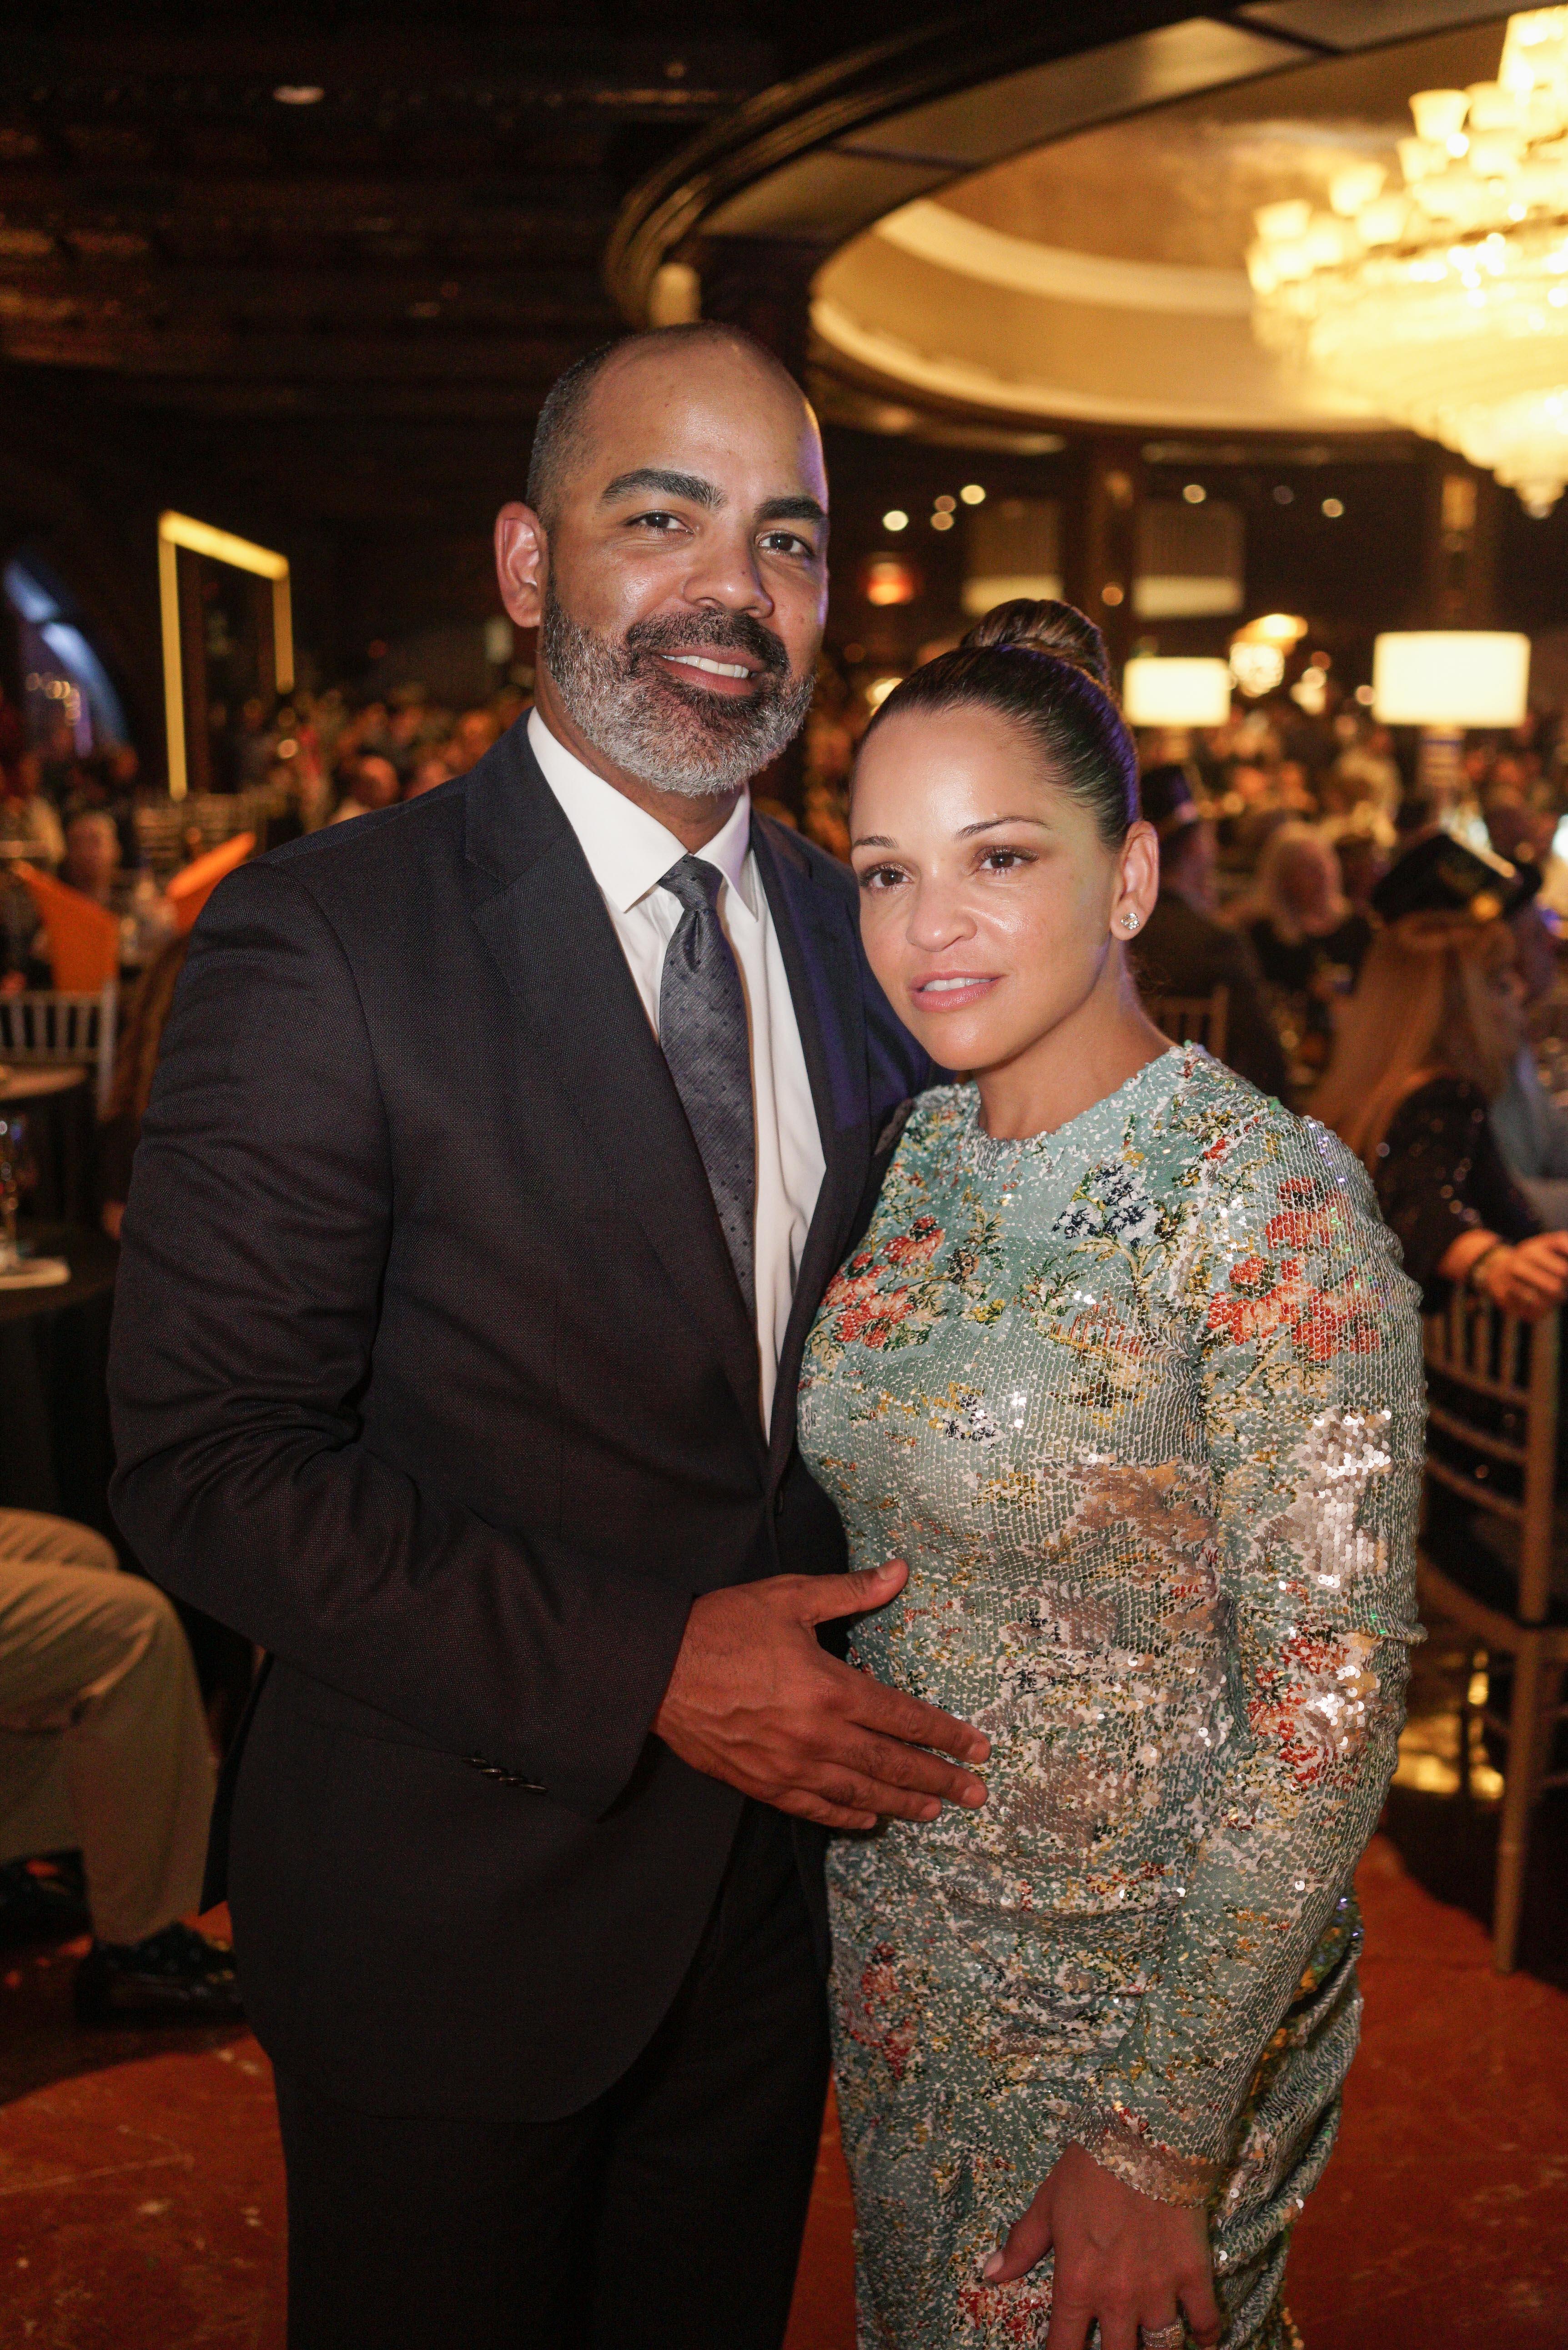 Jason y Yasiria Caraballo. (Suministrada)